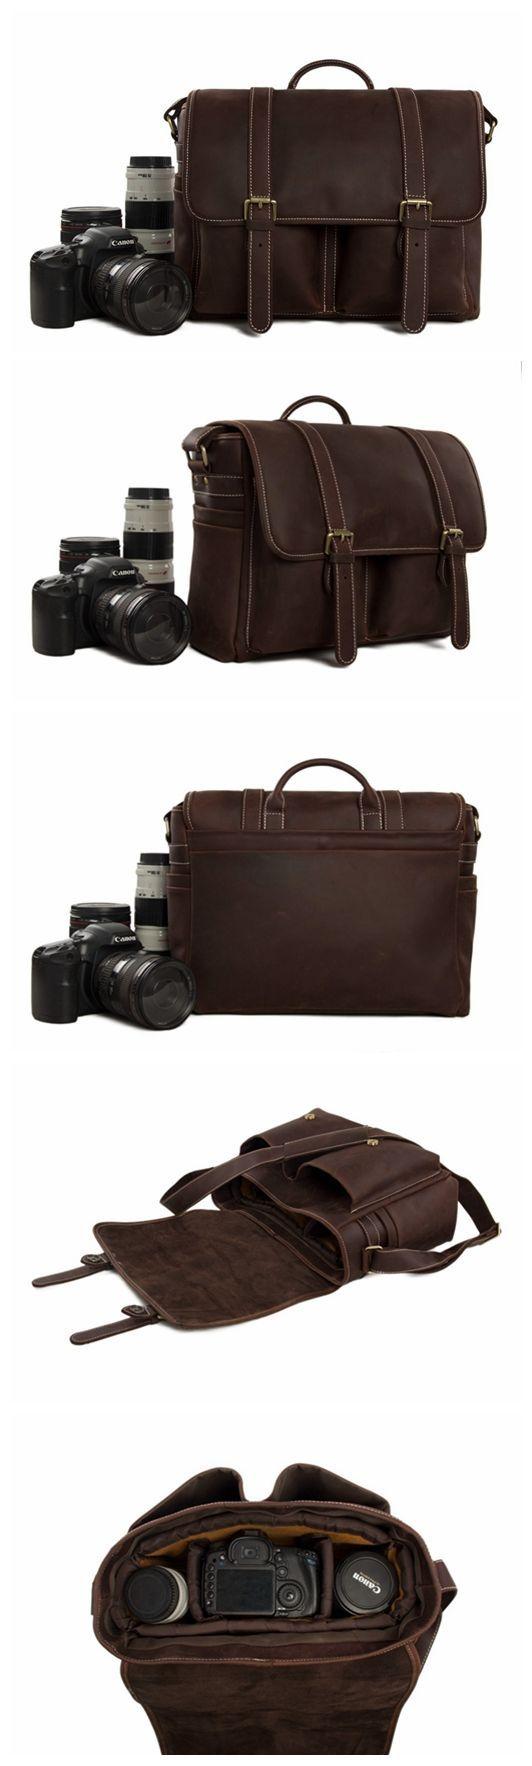 ROCKCOW Vintage Genuine Leather DSLR Camera Bag SLR Camera Bag Leather Camera Bag